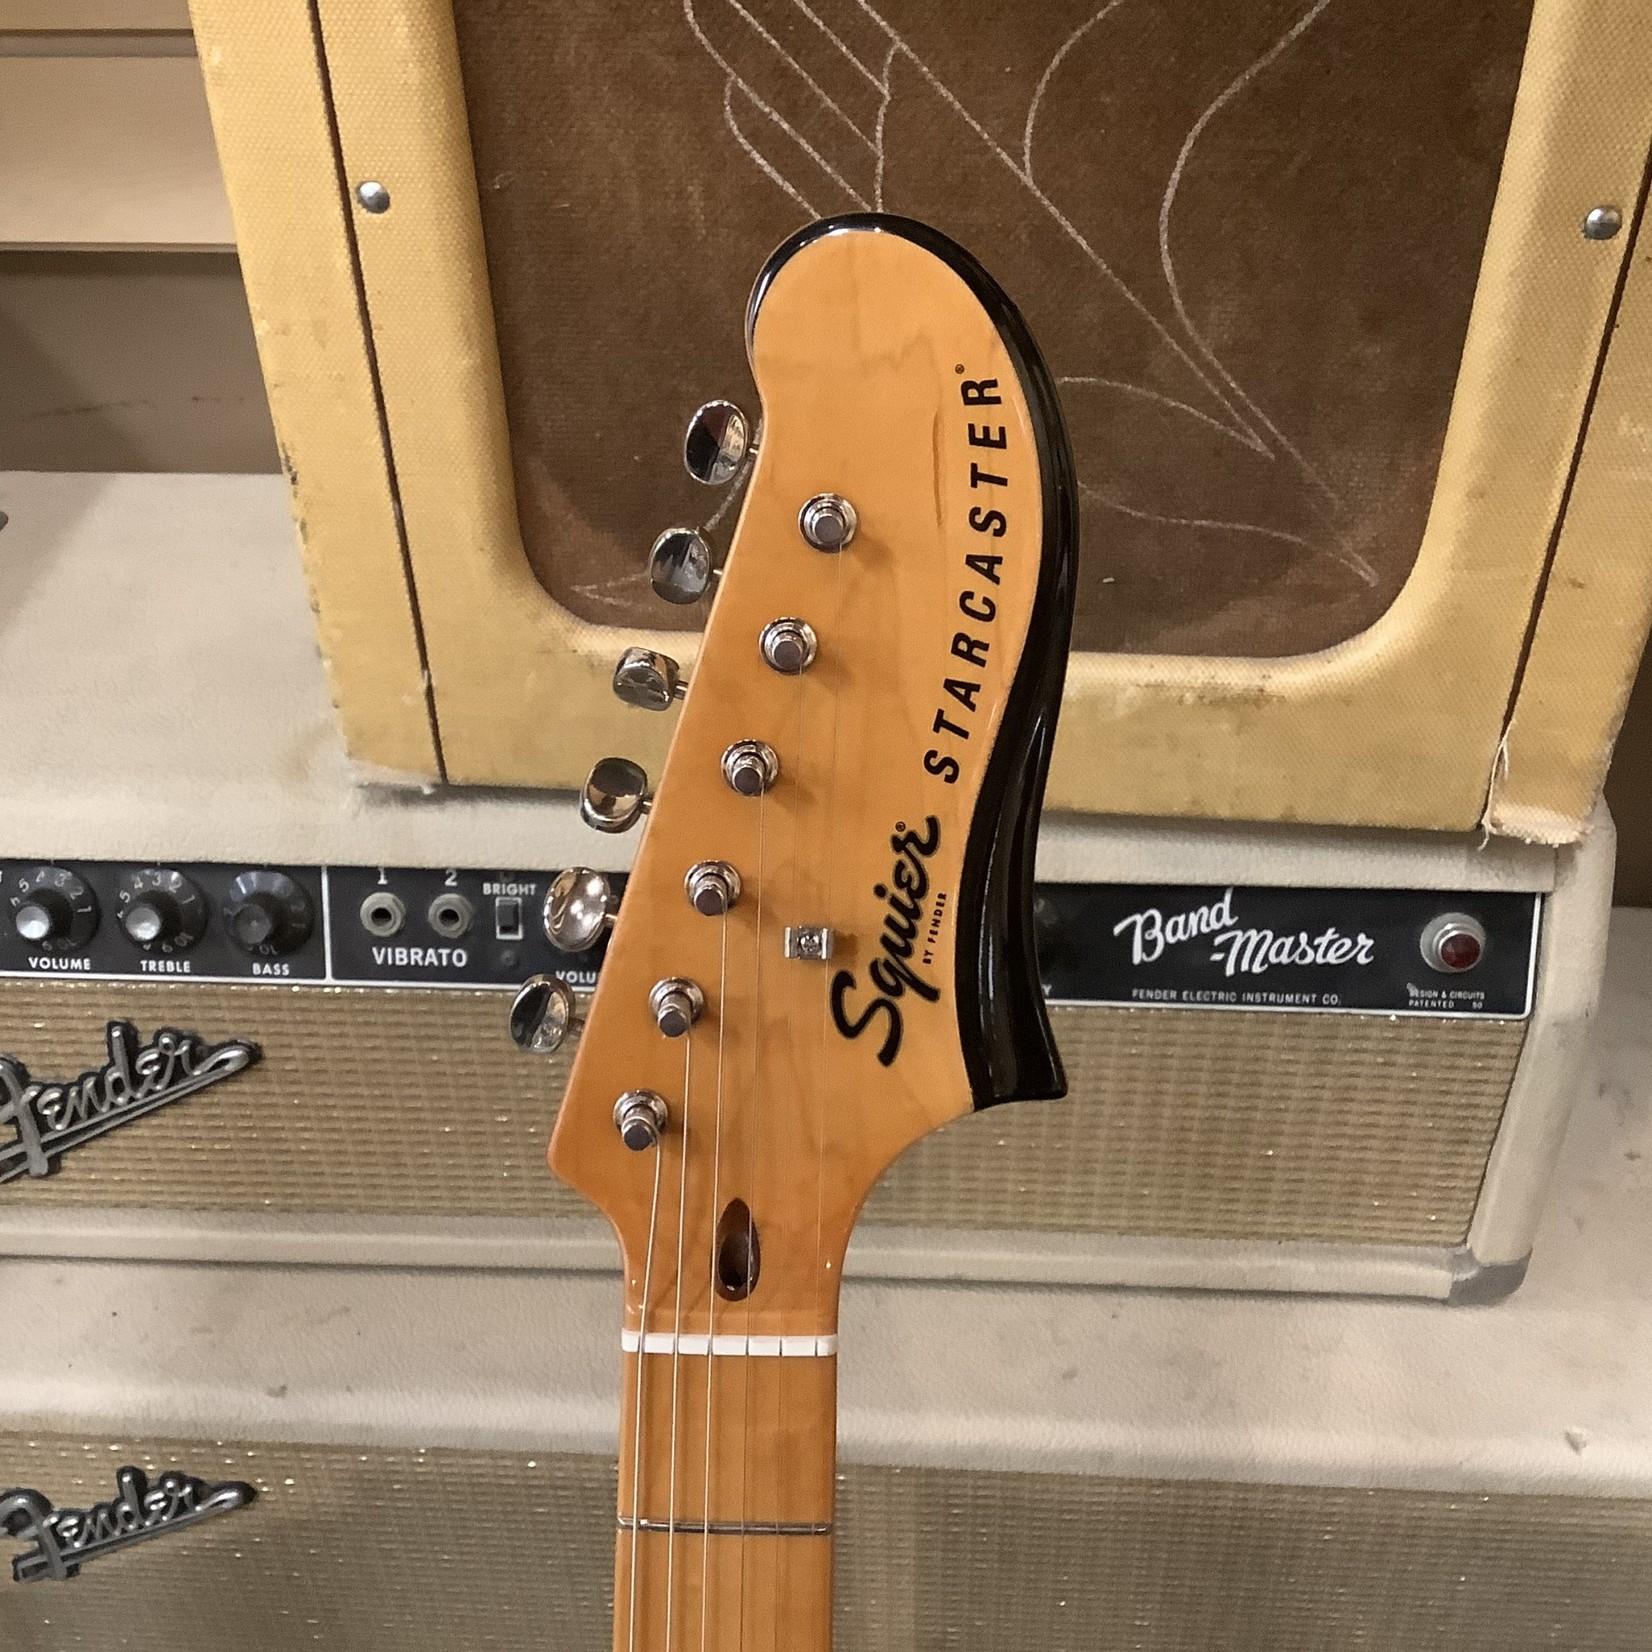 Squier Brand New Fender Squier Classic Vibe Starcaster Sunburst Maple Neck, Three Tone Sunburst